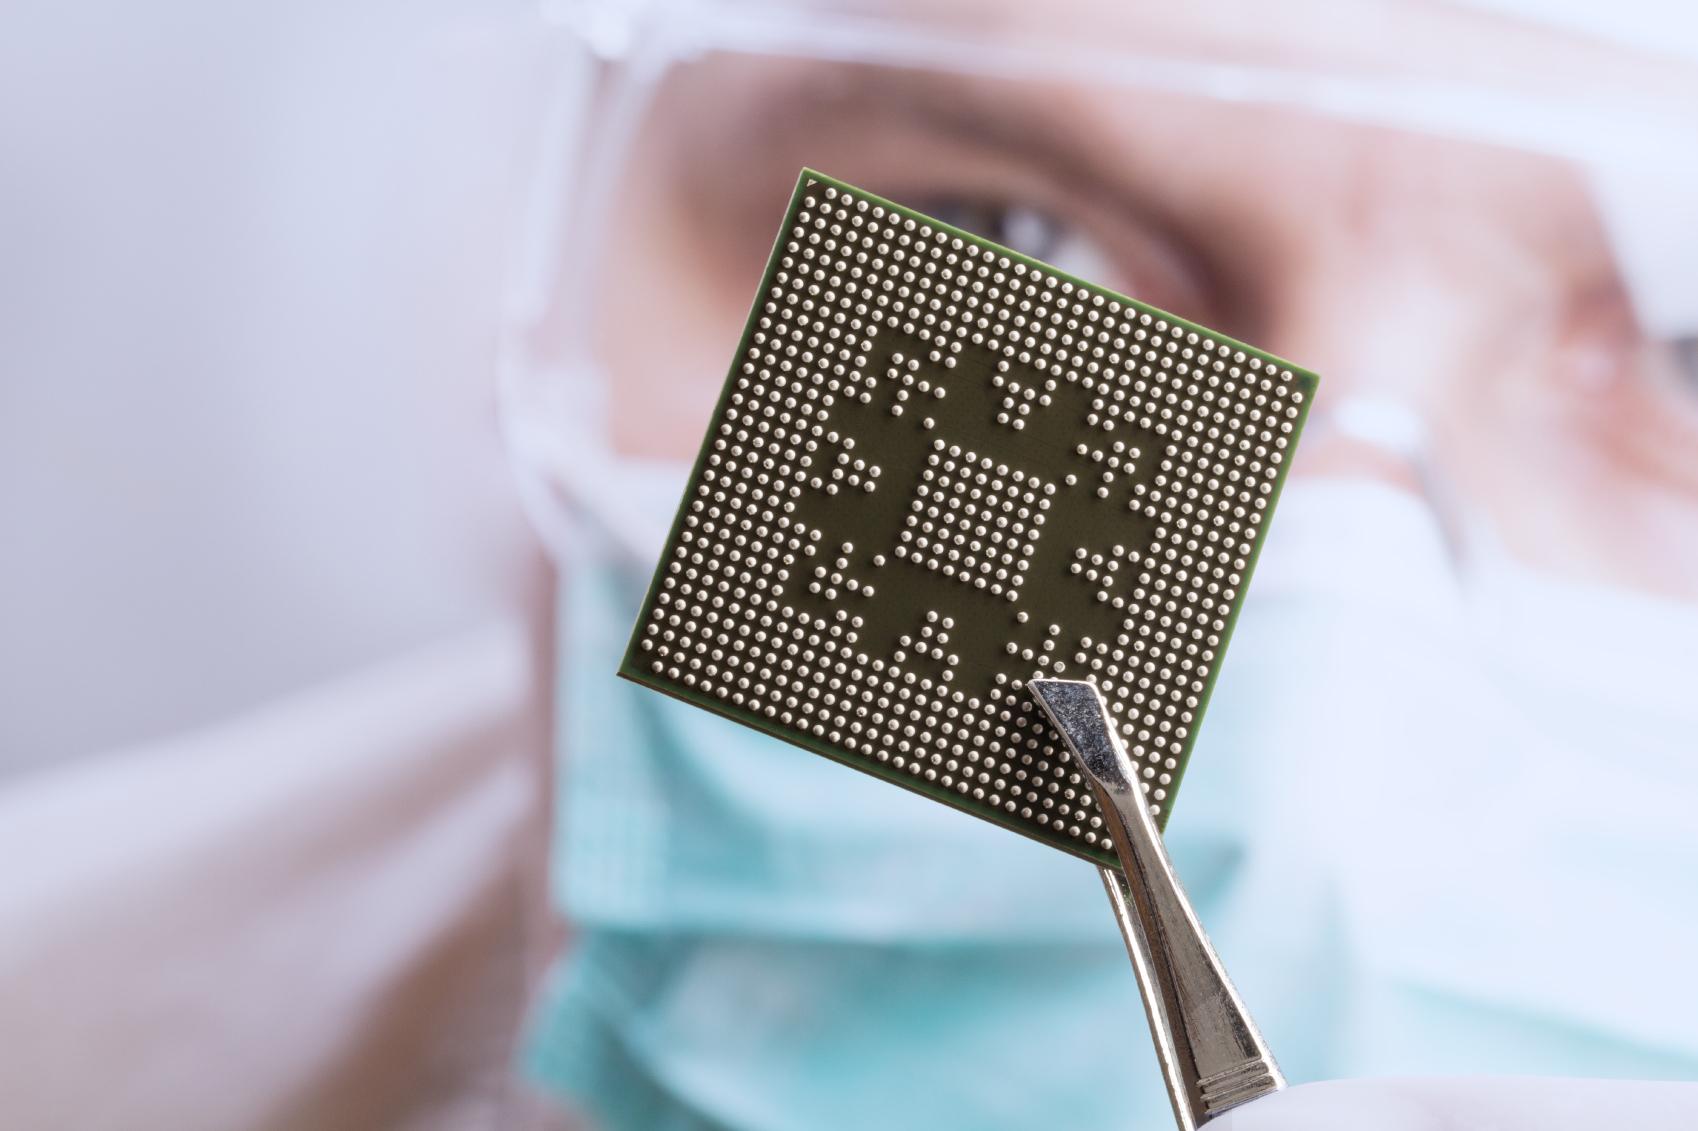 Stock Semiconductor Testing : Brisbane digital director gets microchip implant ahead of